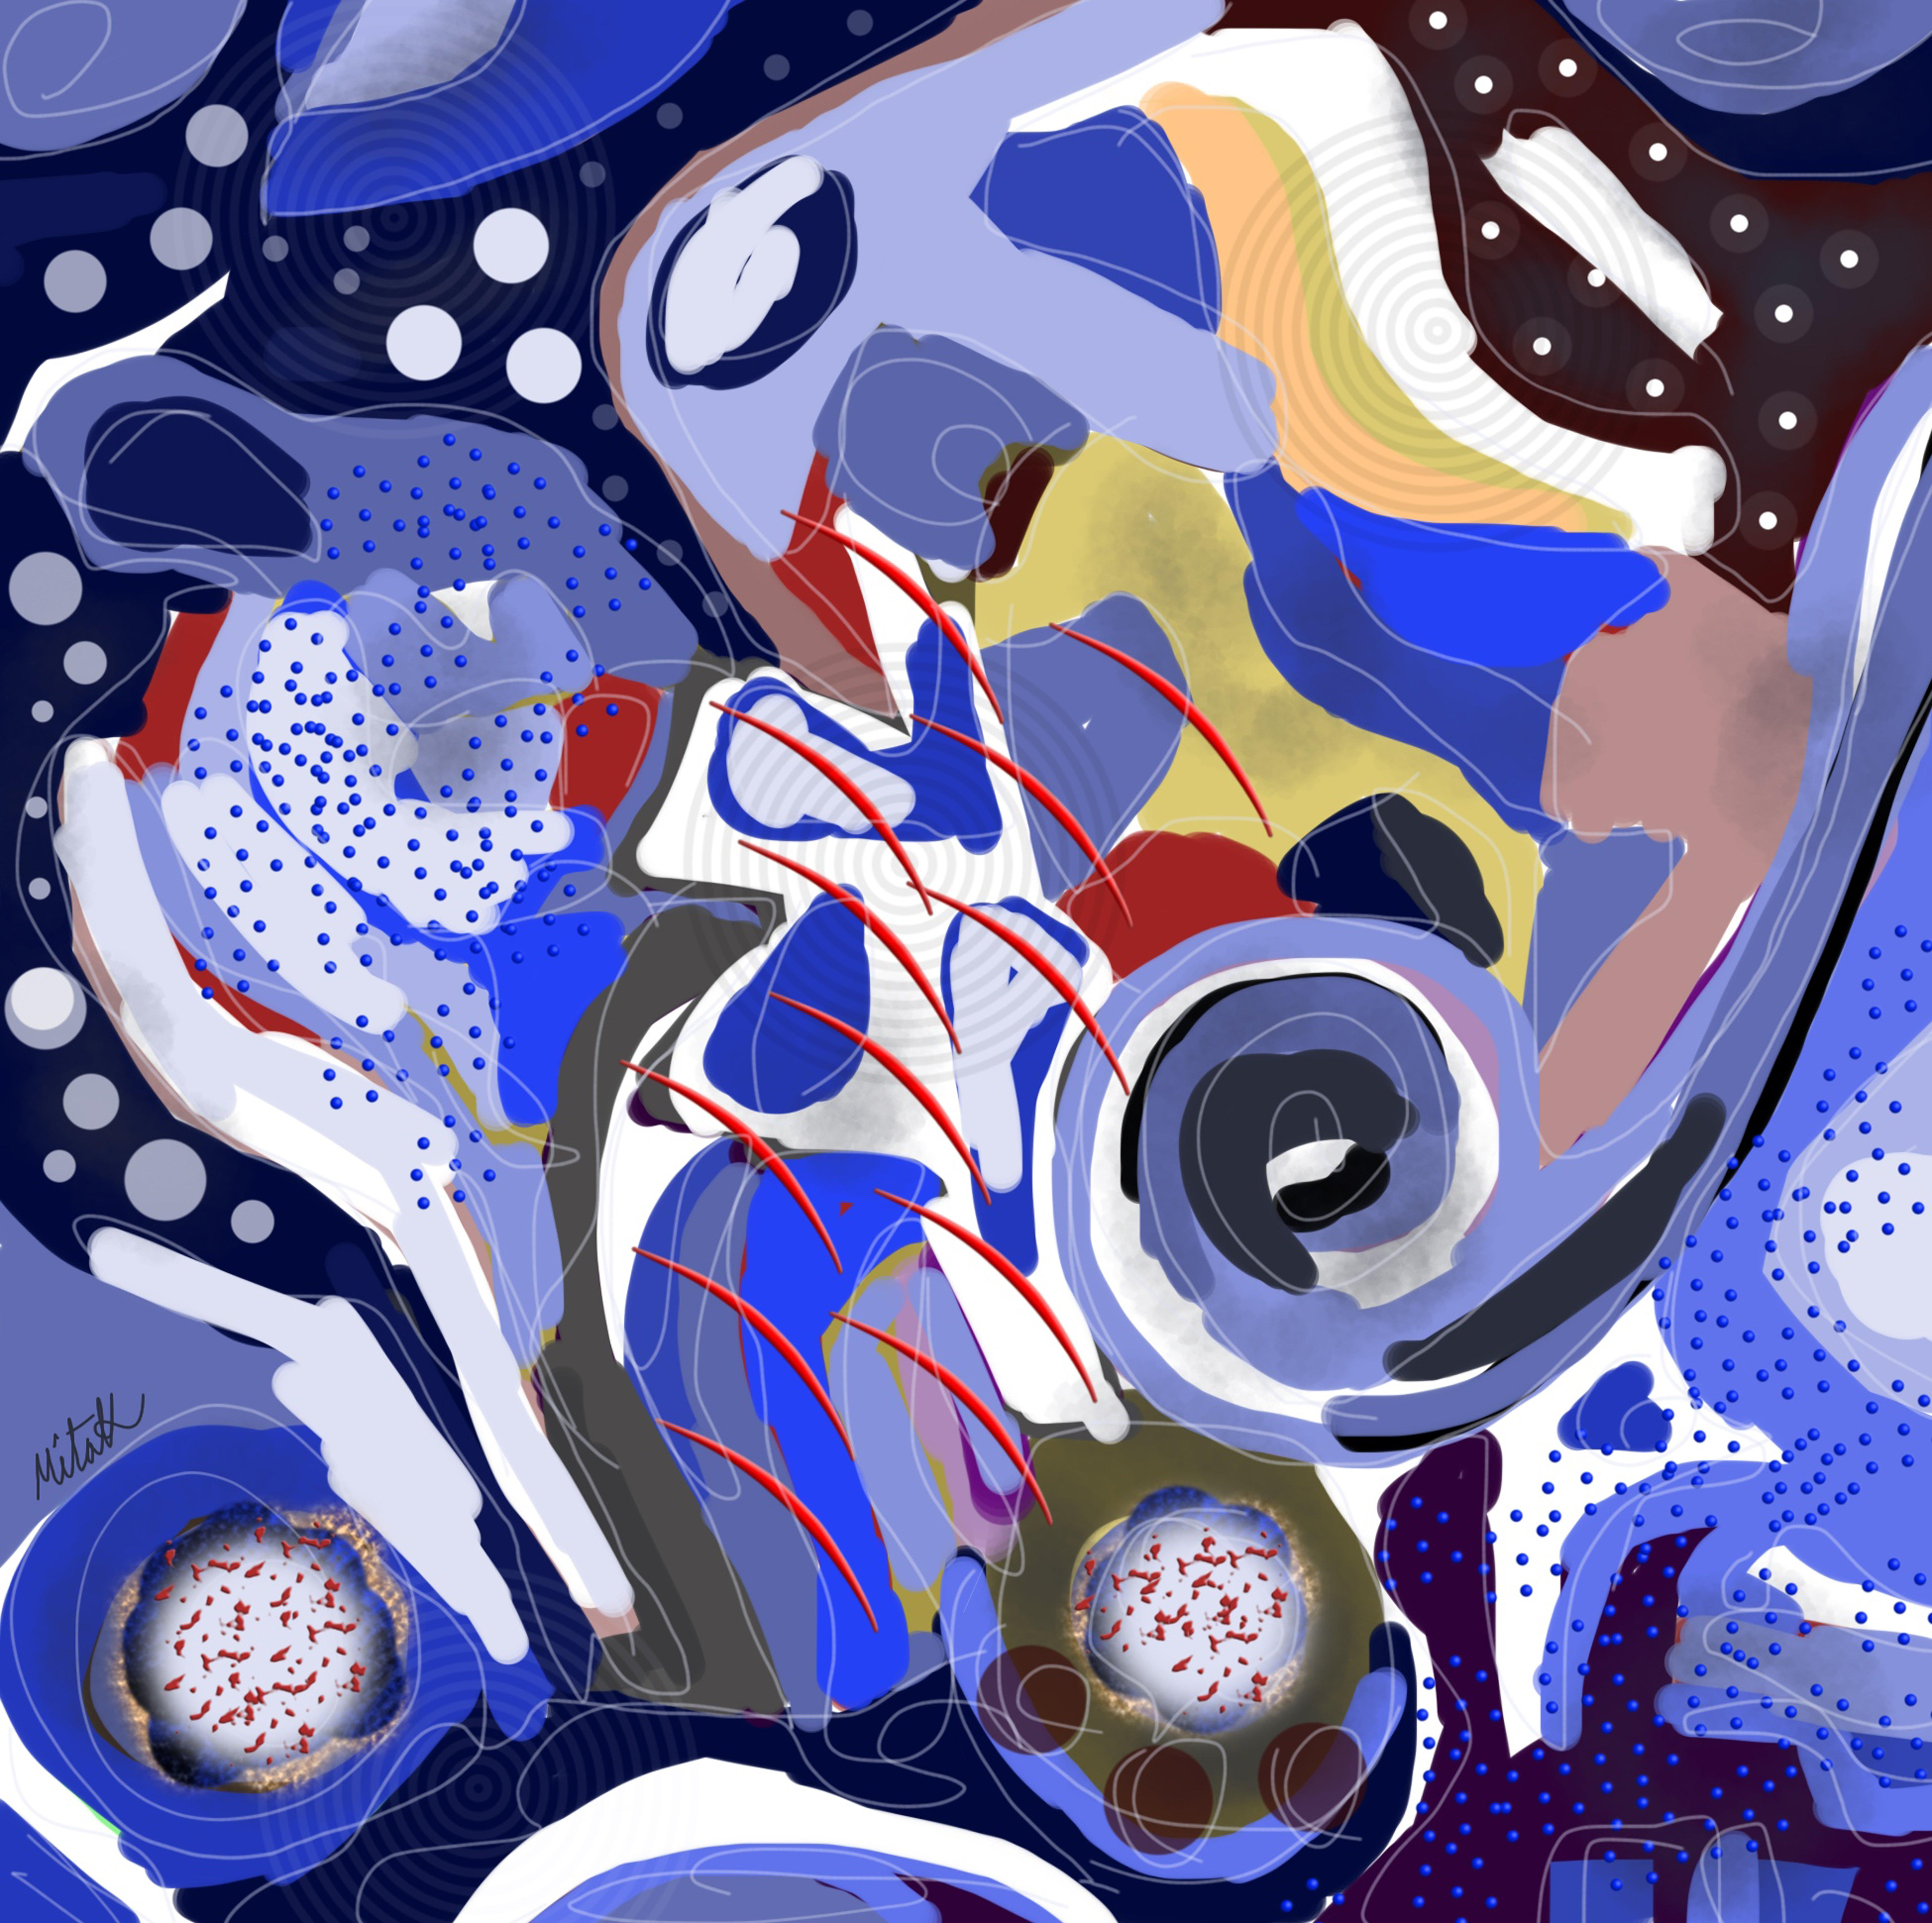 Ocen Currents by Michal Mitak Mahgerefteh